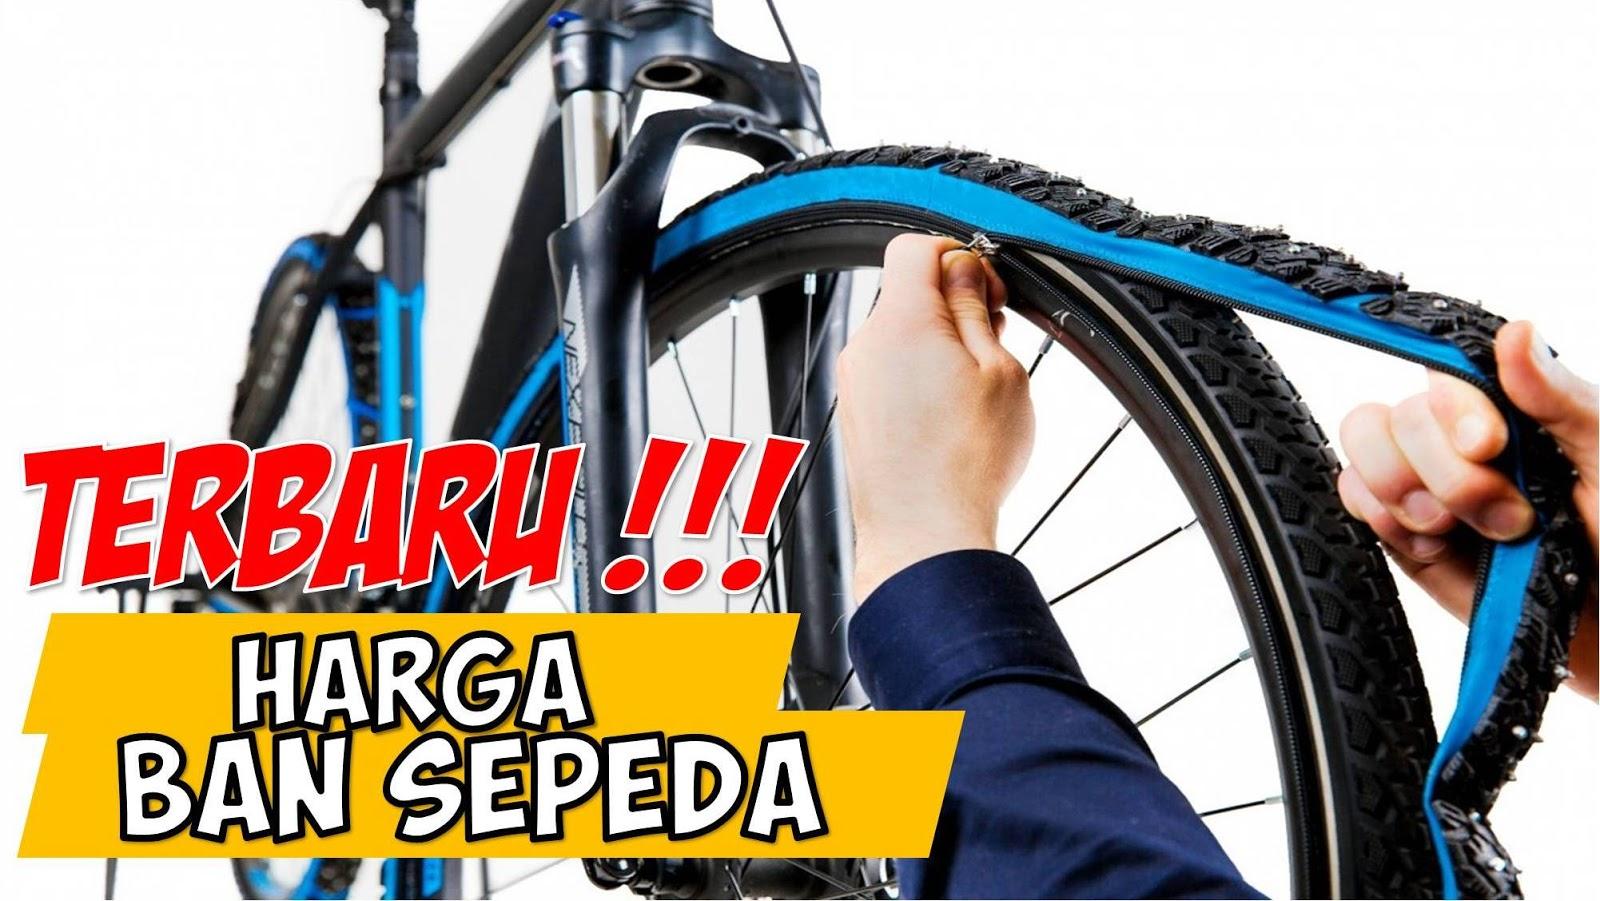 UPDATE] Harga Ban Sepeda Fixie, Gunung, BMX, Anak & Maxxis